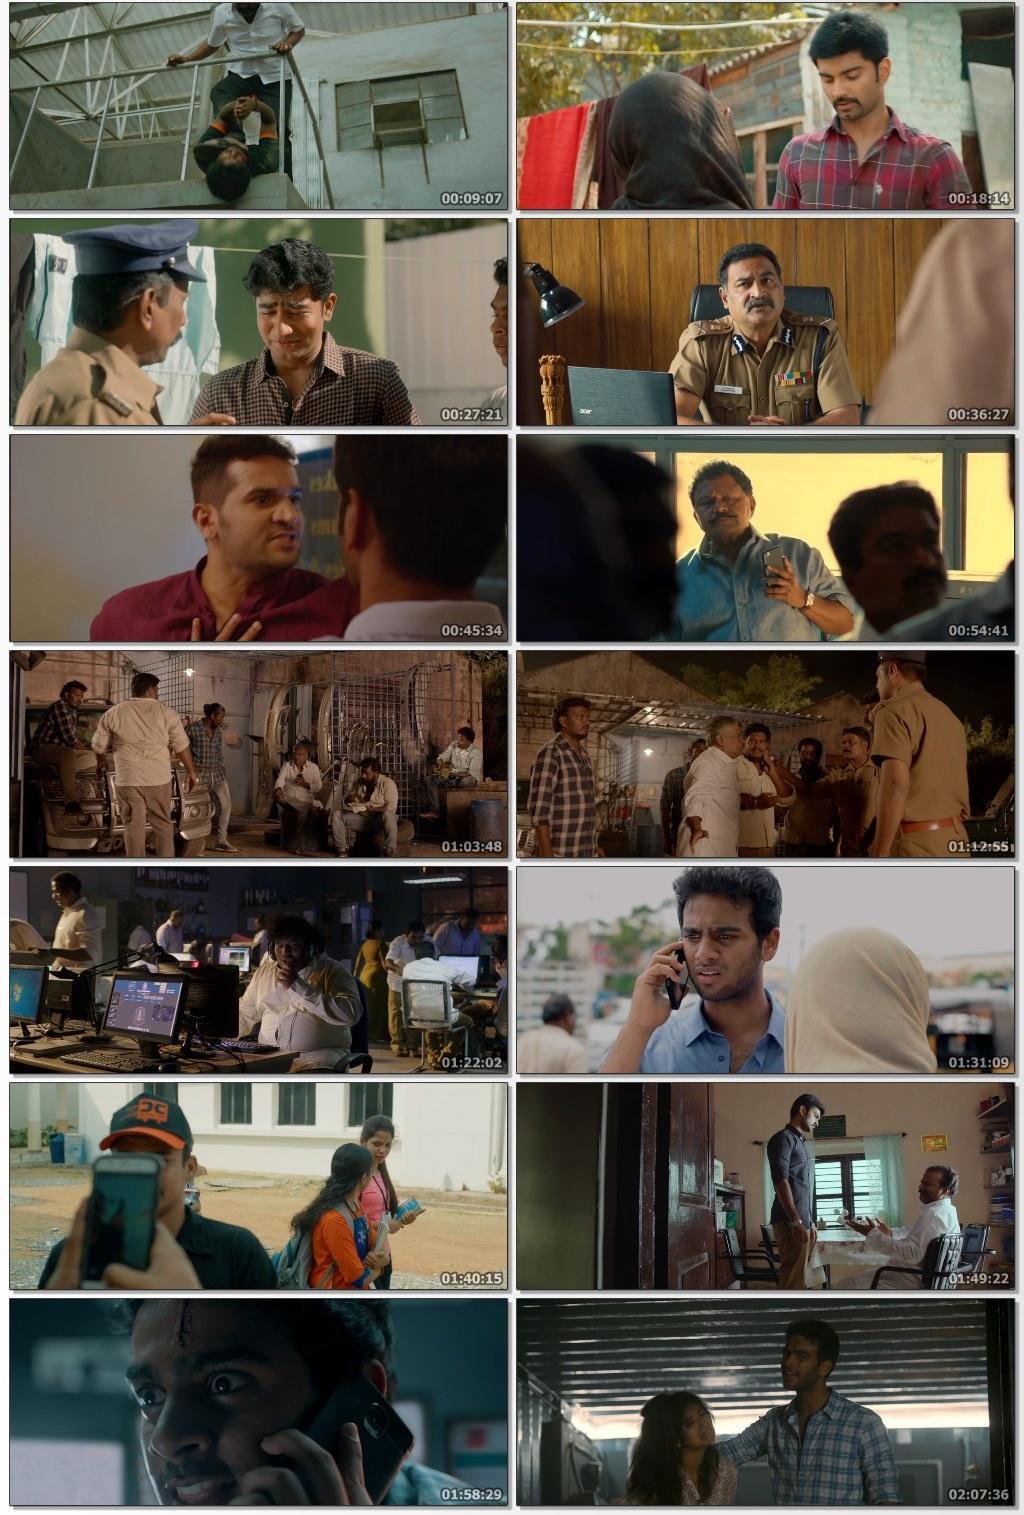 100-2019-www-1kmovies-cyou-Hindi-Dual-Audio-720p-UNCUT-HDRip-ESubs-1-4-GB-mkv-thumbs